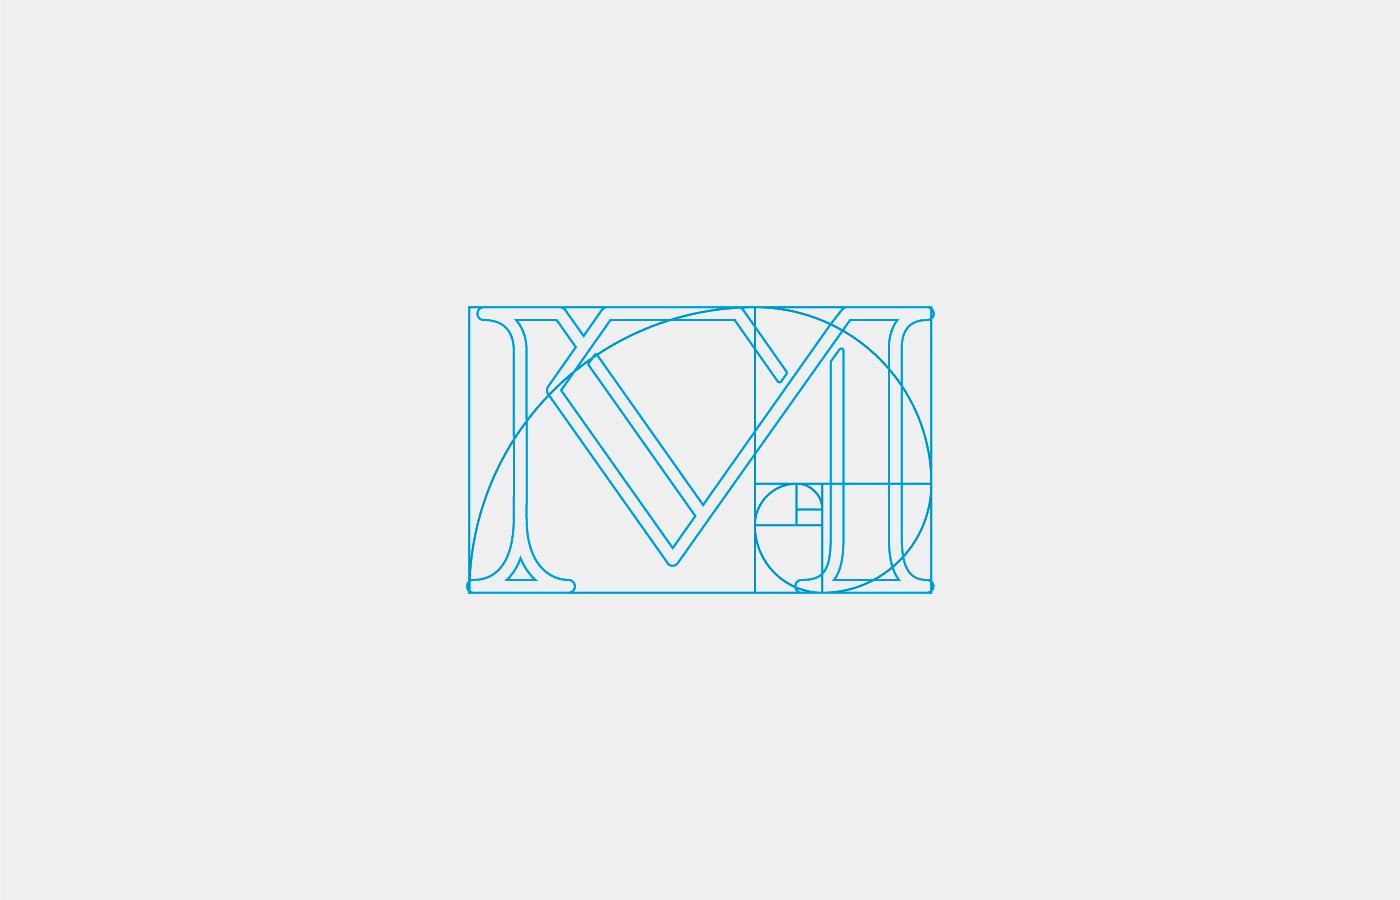 logo Golden Ratio Icon logofolio symbols Collection logotipos  marcas logotypes Proporção Áurea